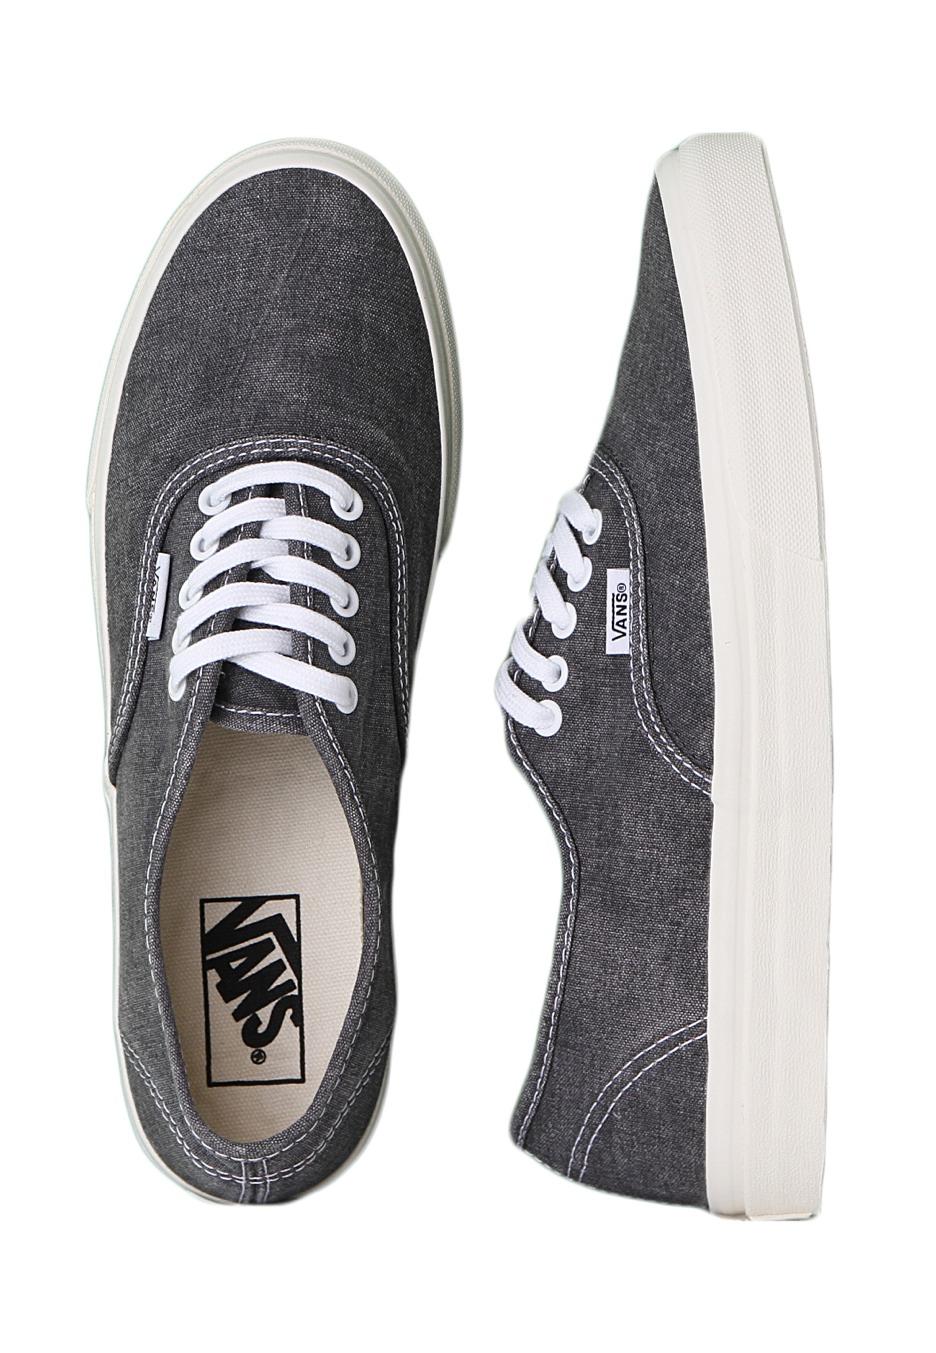 02a2b54dde Vans - Authentic Slim Washed Black - Girl Shoes - Impericon.com UK